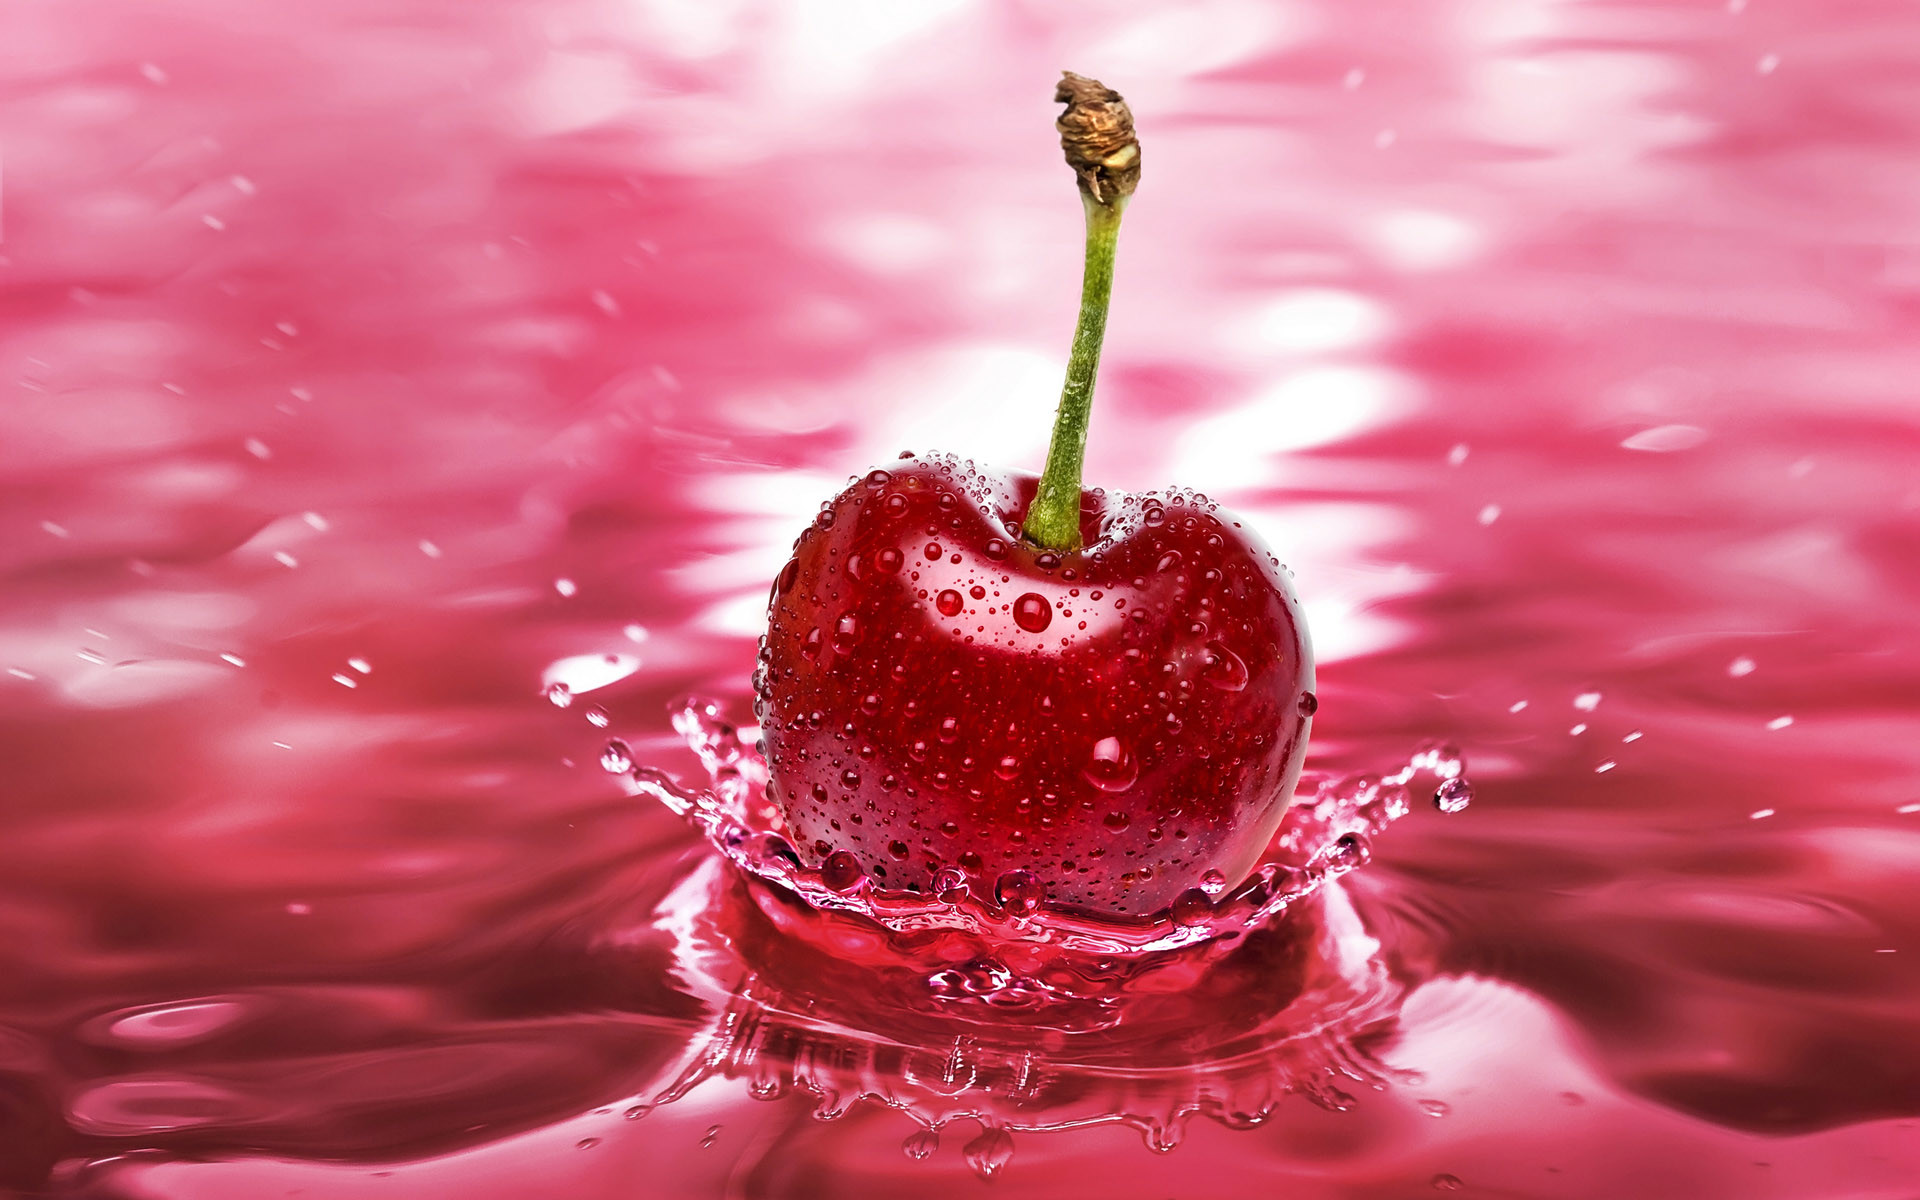 Res: 1920x1200, hd-fresh-apple-3d-wallpaper.jpg